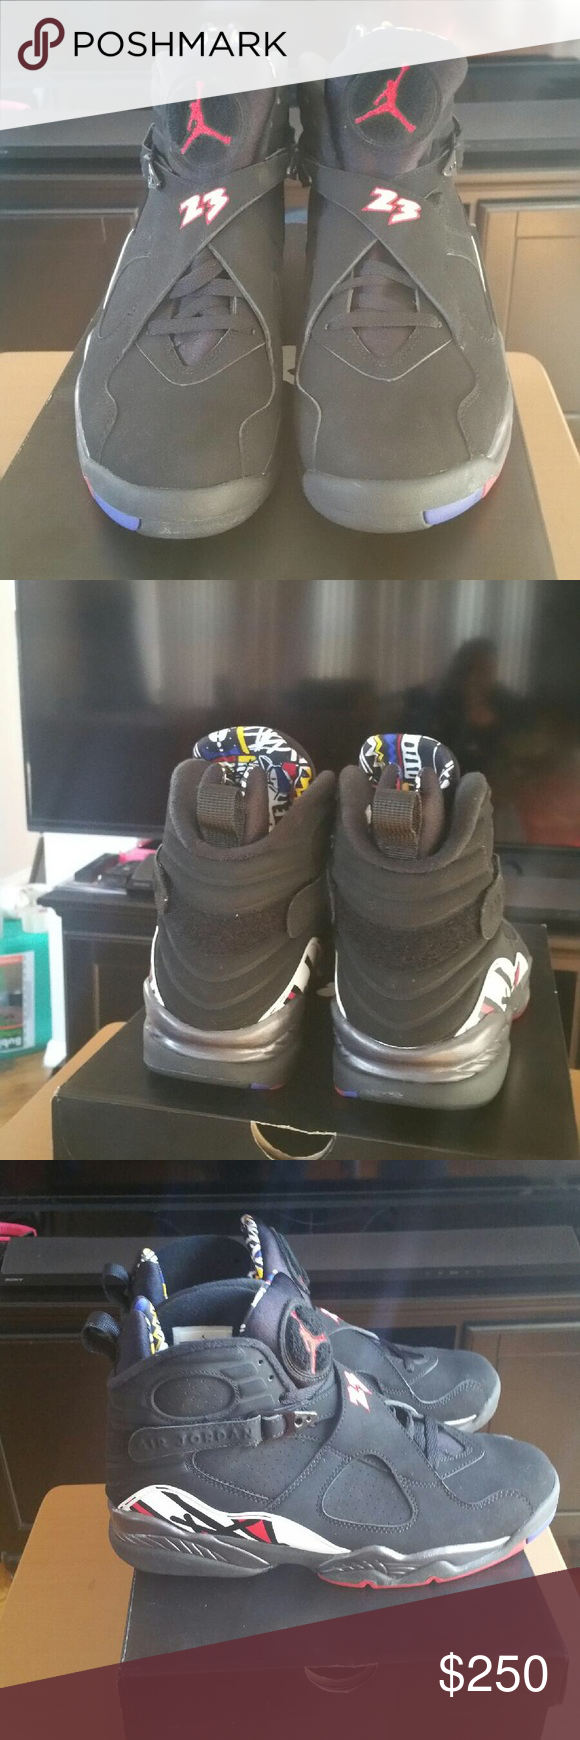 Brand New Jordan's 8's Retro Brand New in the Box - Brand New Jordan's 8's Retro. PRICE IS FIRM UNLESS BUNDLED. Jordan Shoes Sneakers